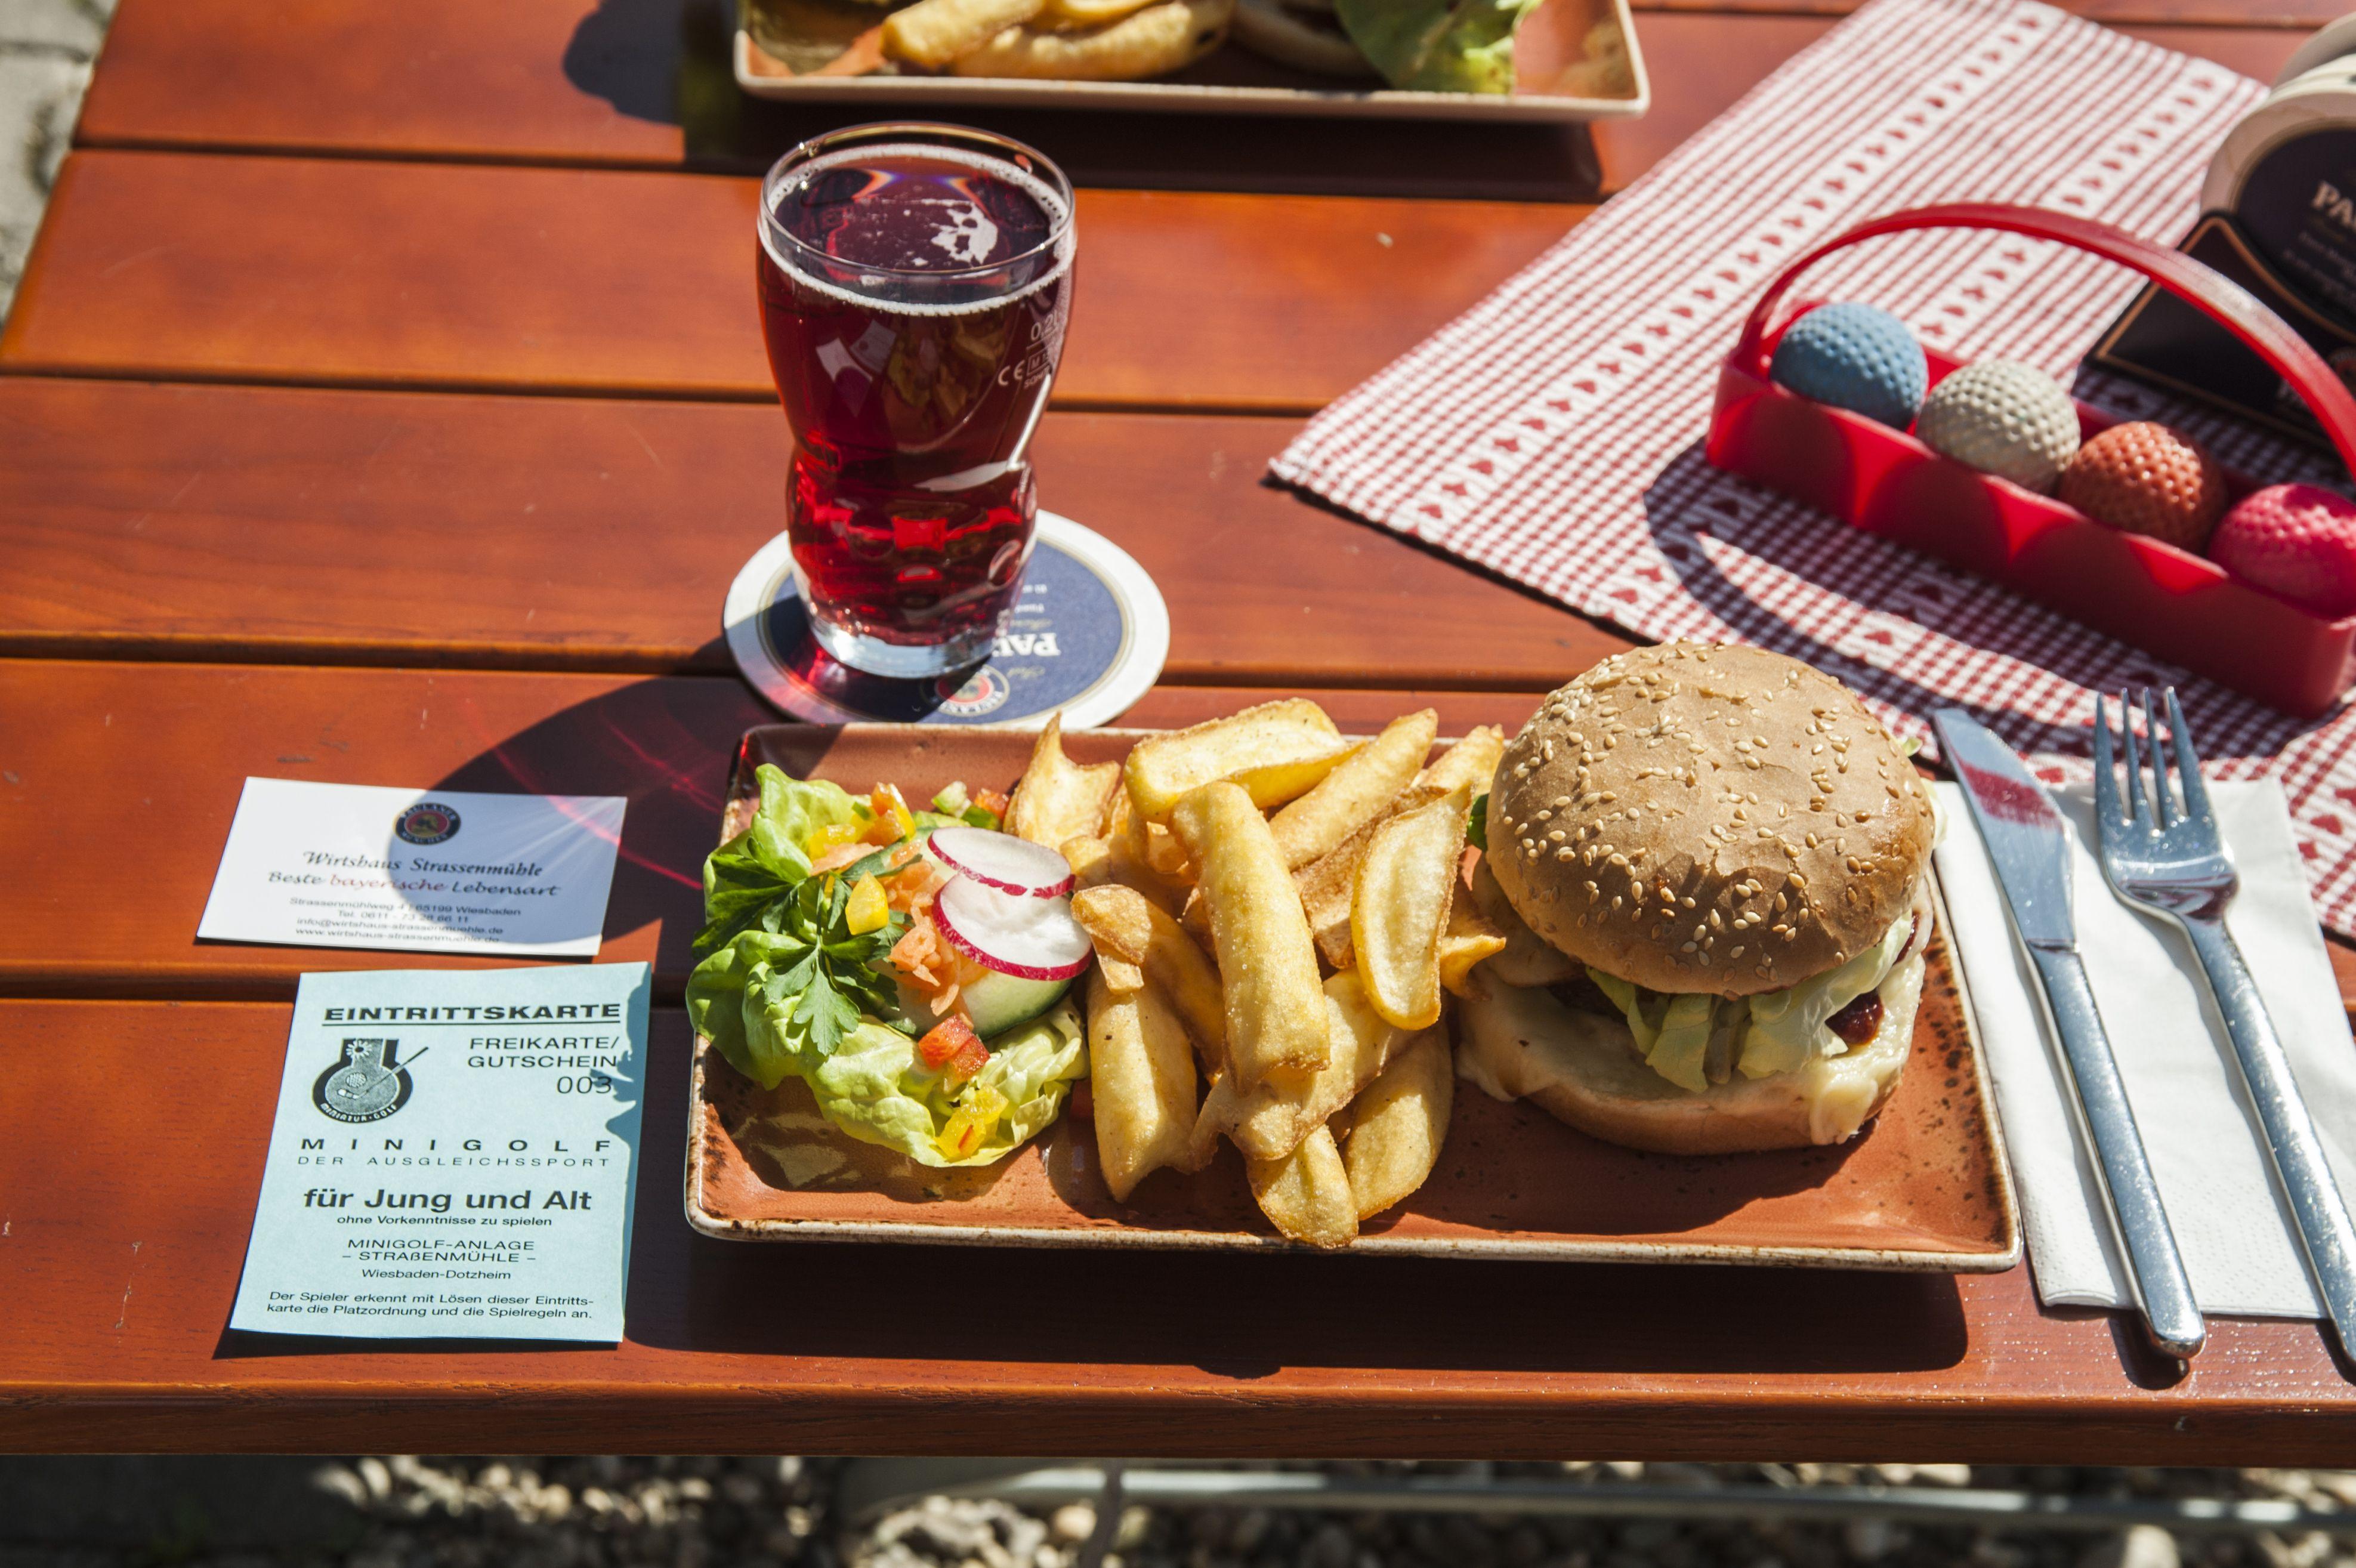 Wo Kann Man Gut Essen In Wiesbaden